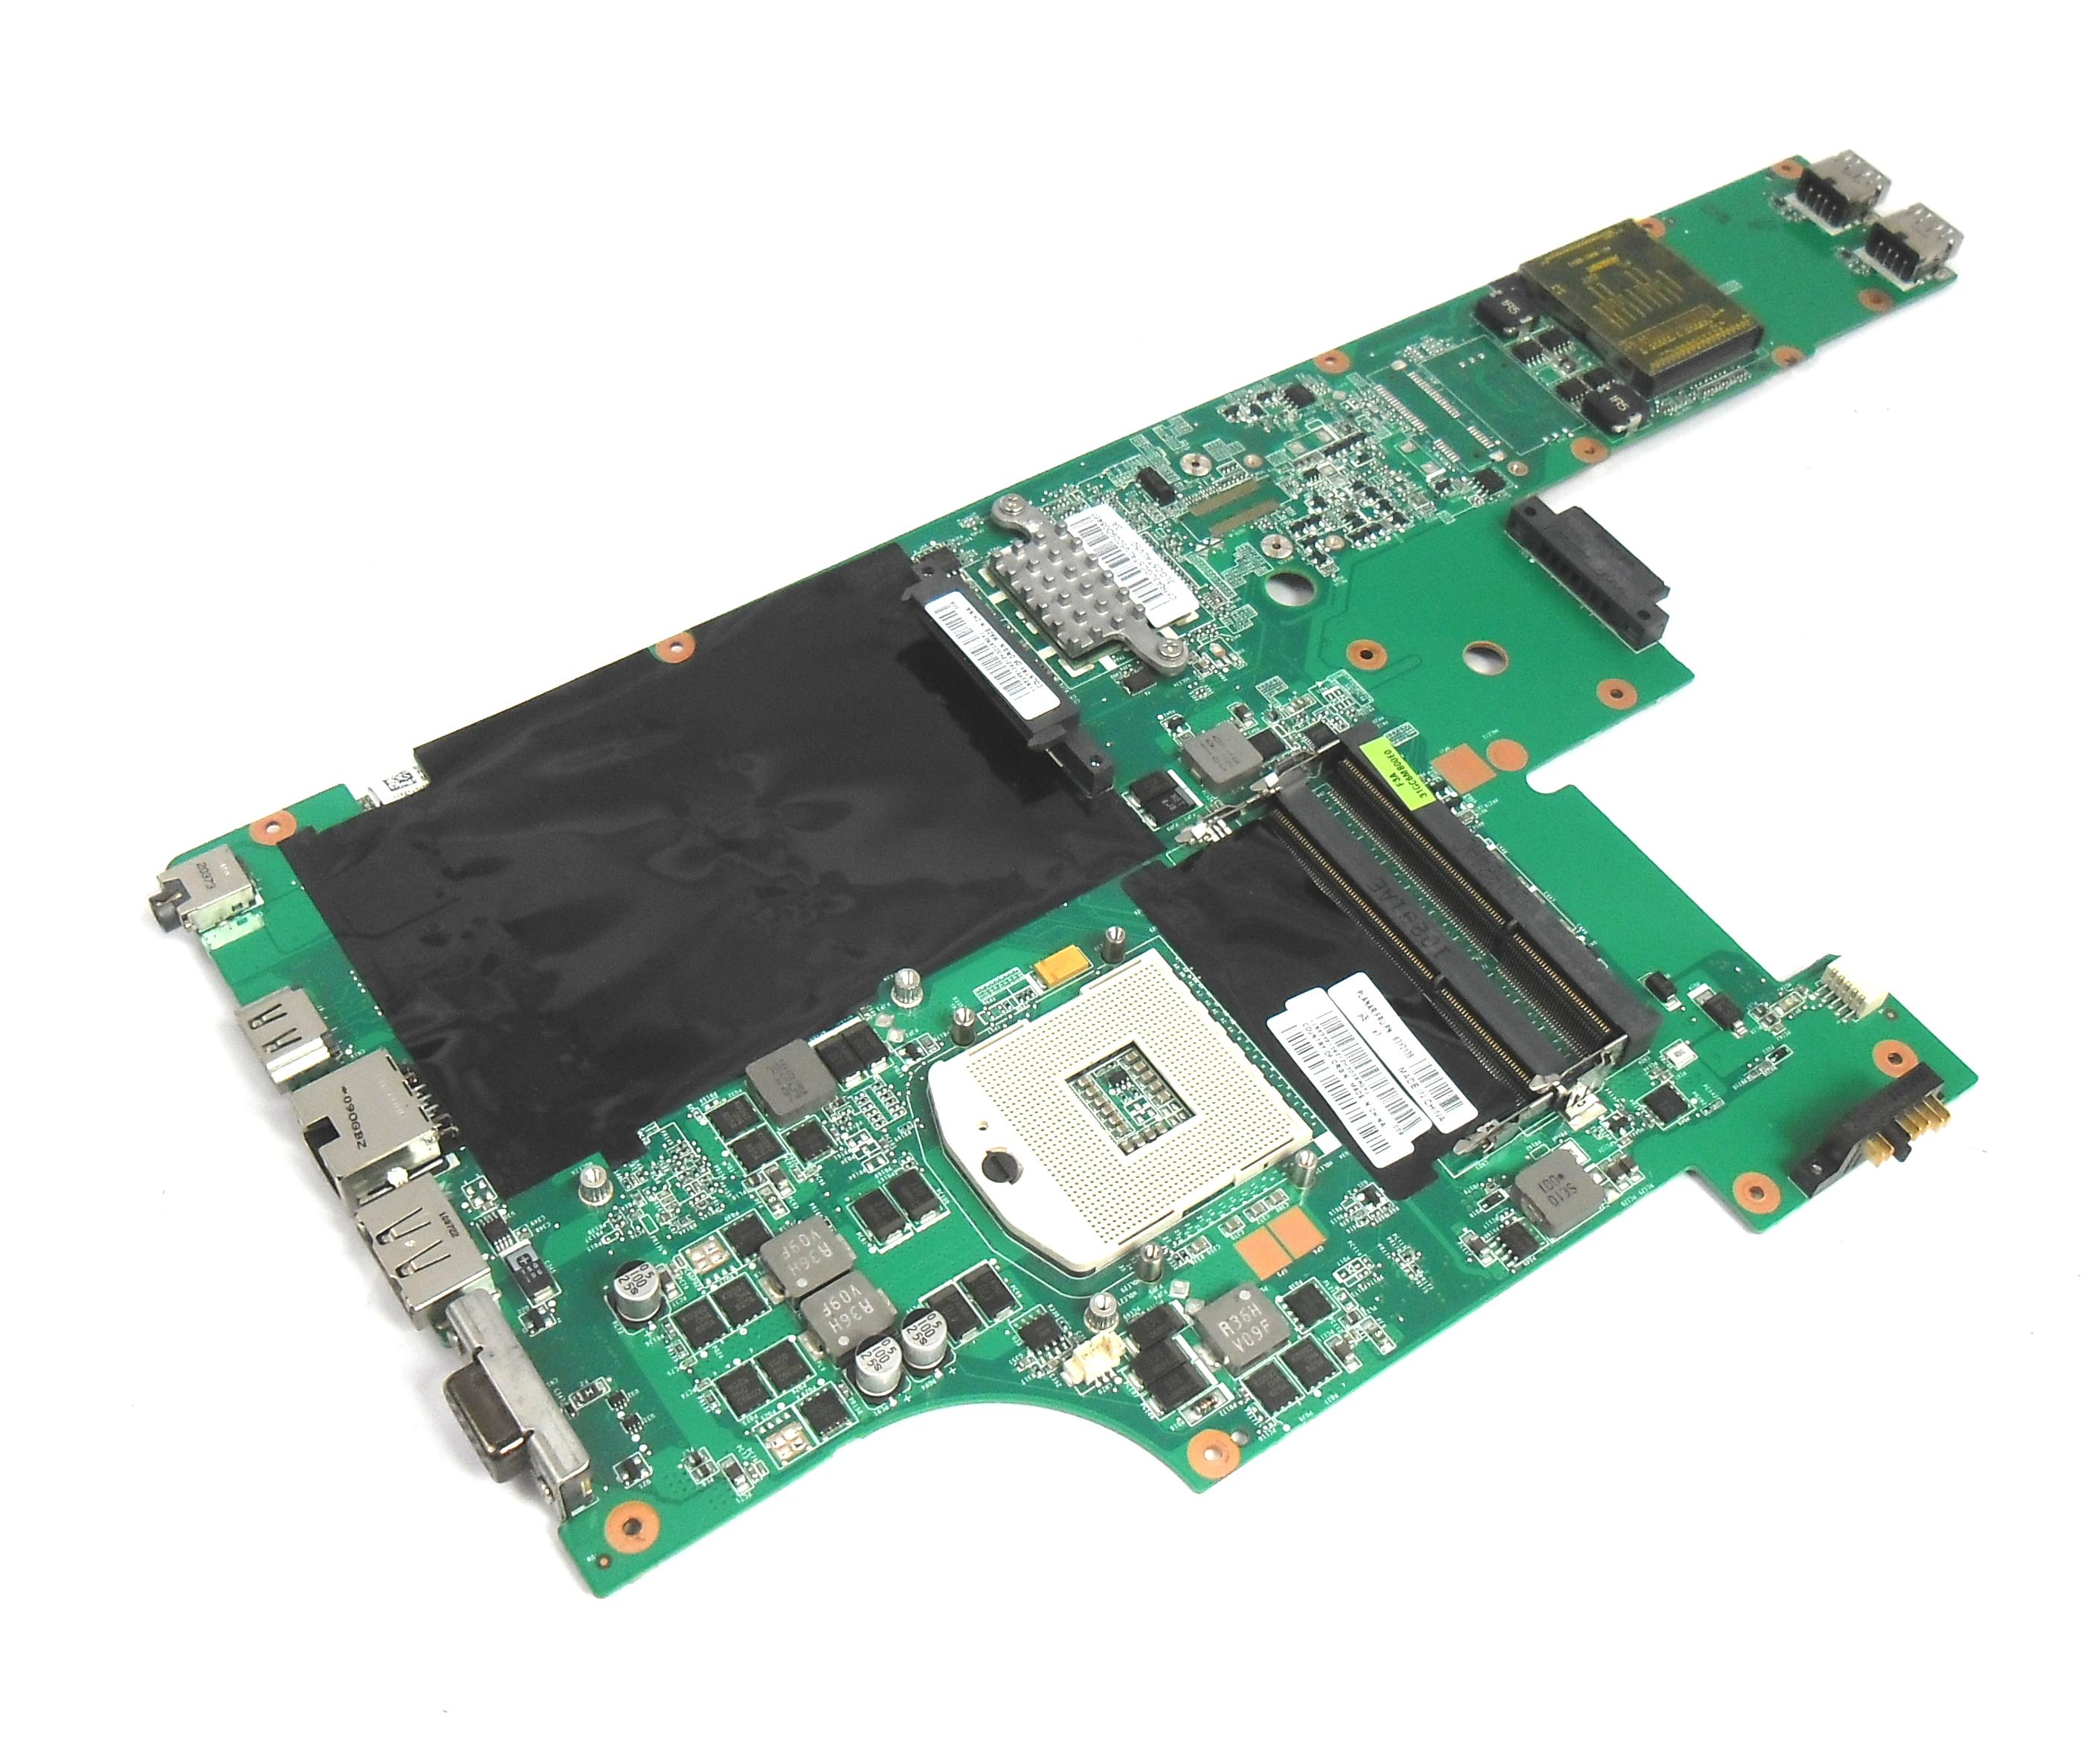 Lenovo 63Y2138 ThinkPad Edge 15 Type:0301-GQG Laptop Motherboard